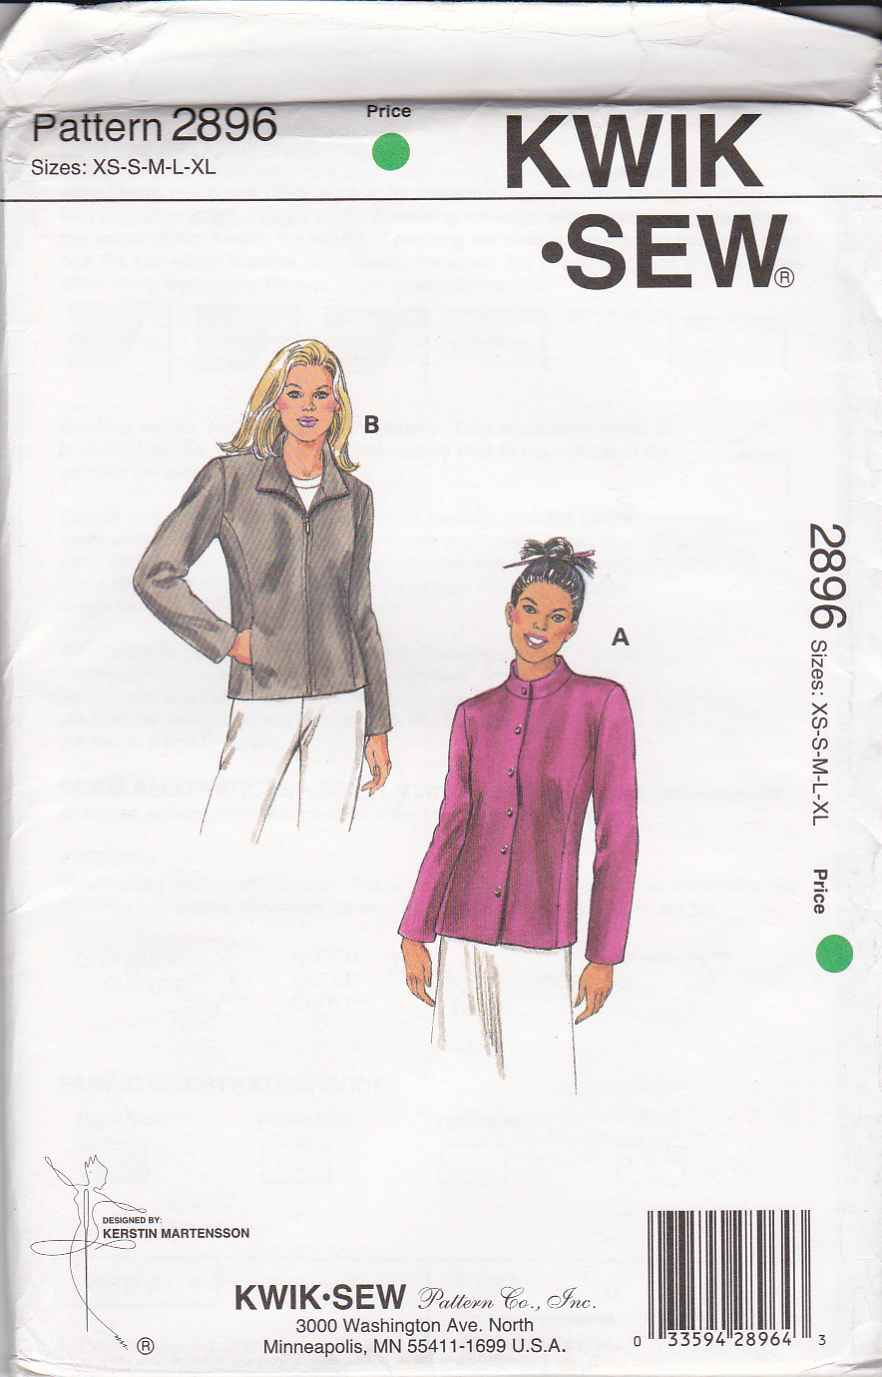 Kwik Sew Sewing Pattern 2896 Misses Size XS-XL (approx 6-22) Long Sleeve Button Zipper Front Jacket